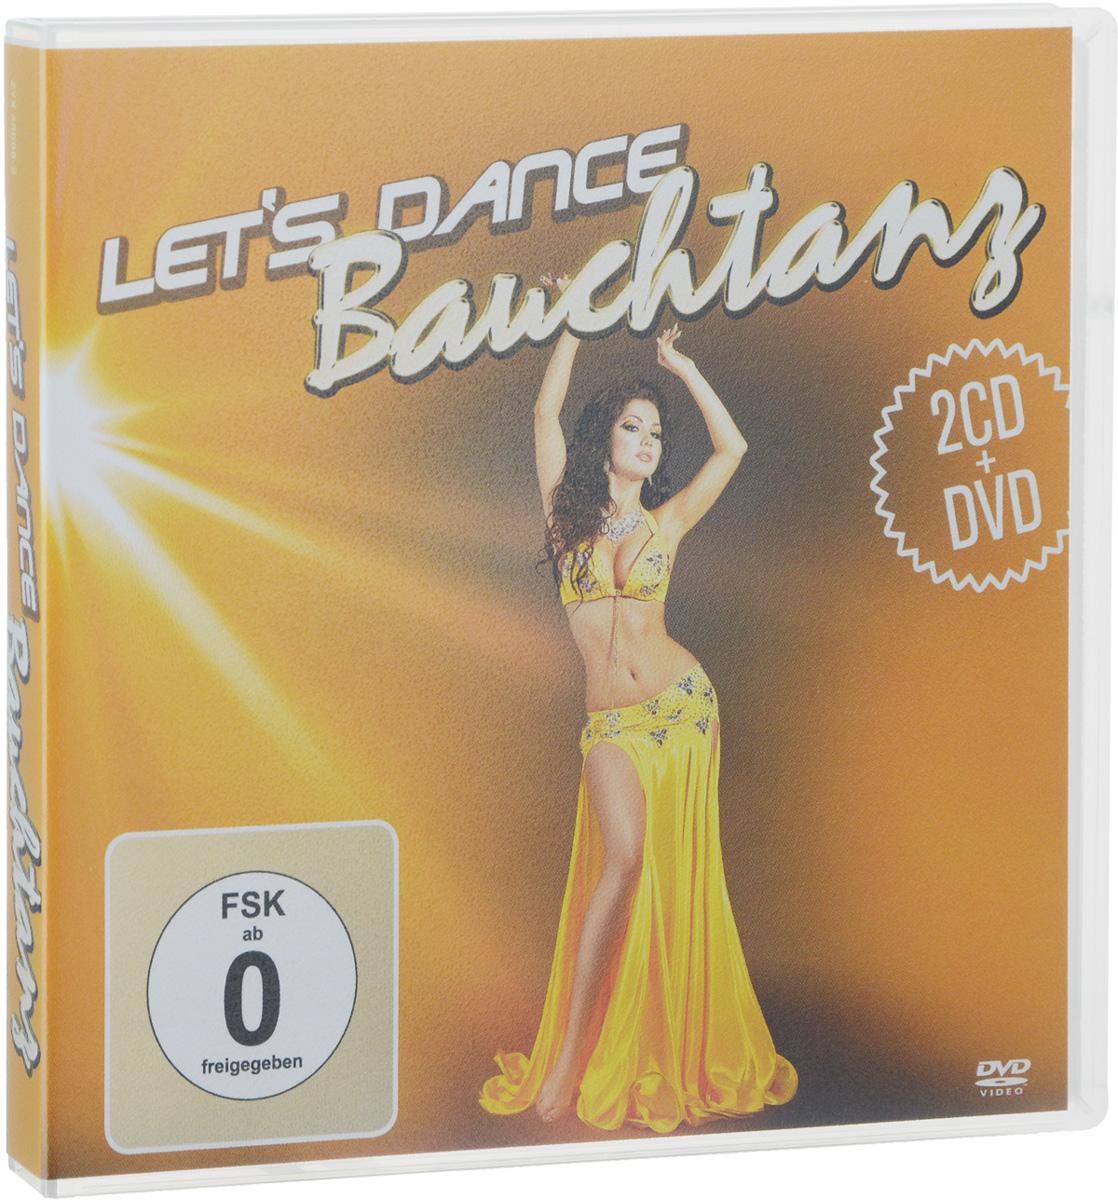 The Sout El Hob Band Let's Dance. Bauchtanz (2 CD + DVD) van der graaf generator van der graaf generator live in concert at metropolis studios london 2 cd dvd